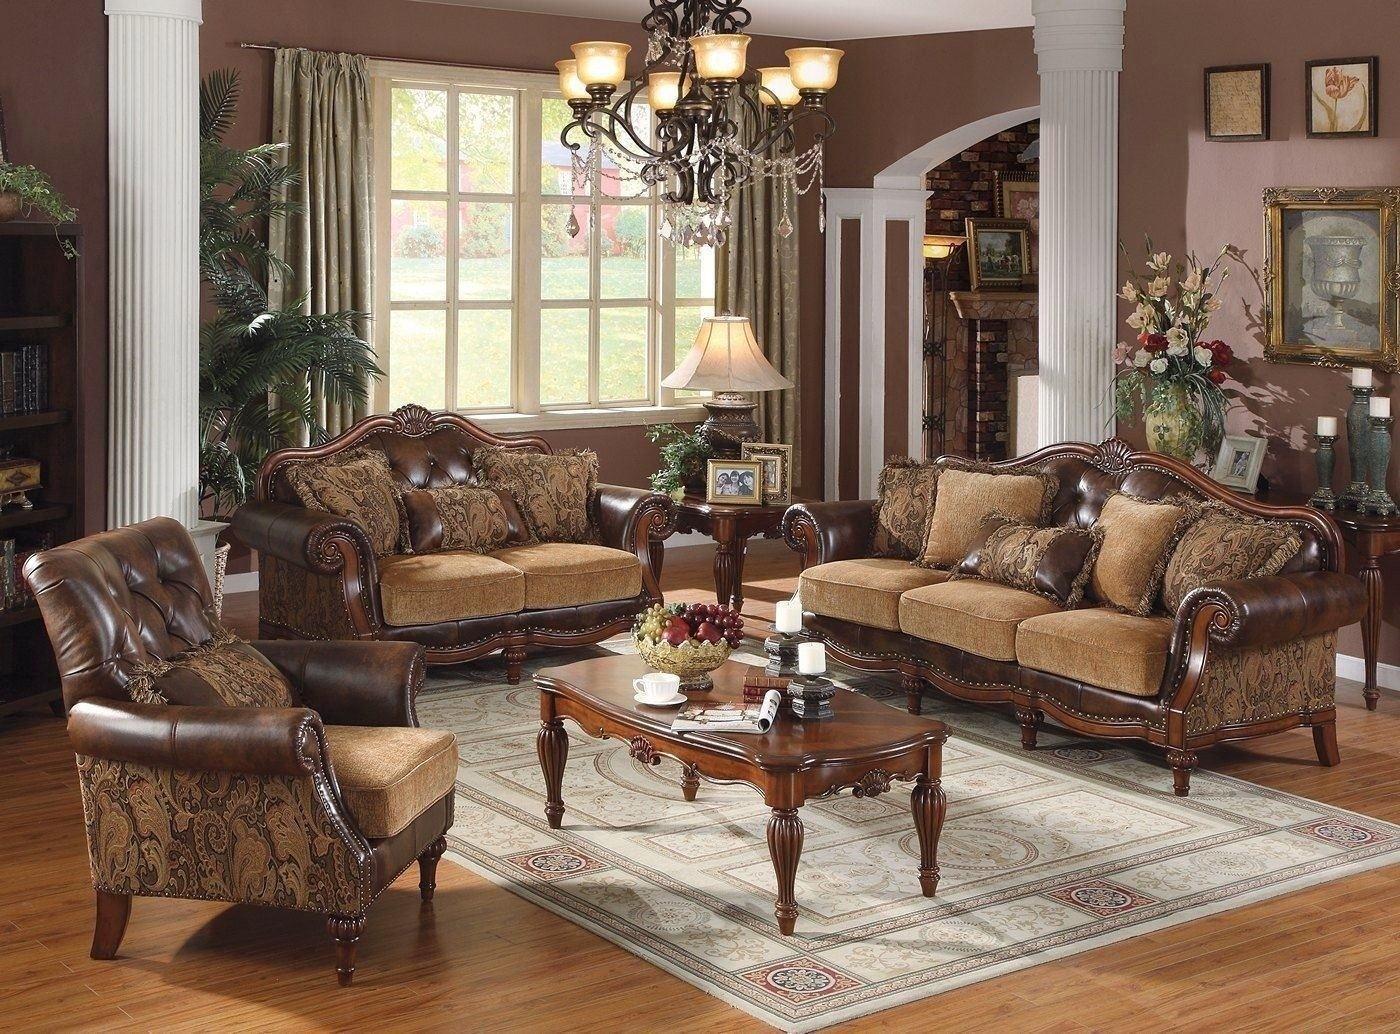 Traditional Style 3pc Formal Living Room Furniture Sofa Set Carved Wood Frames